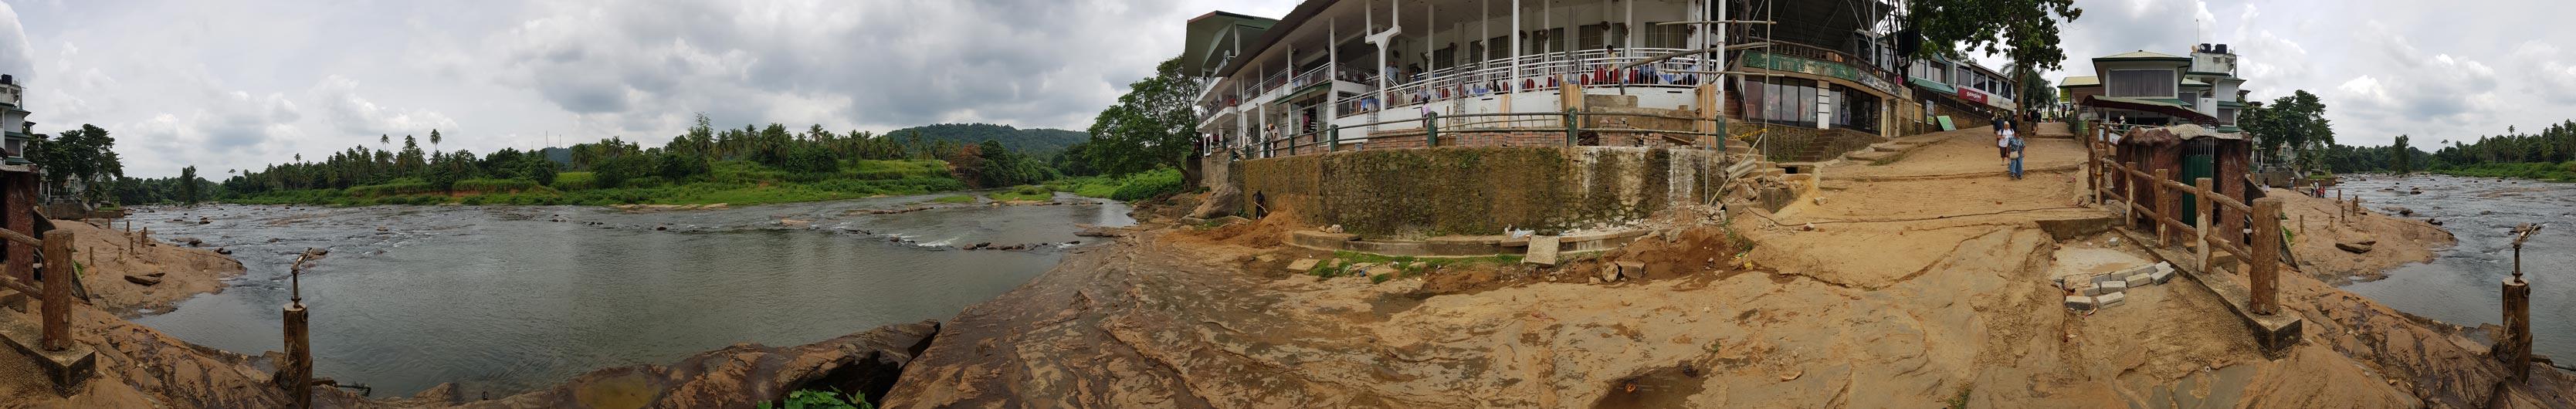 Panorama di Pinnawela (senza elefanti)